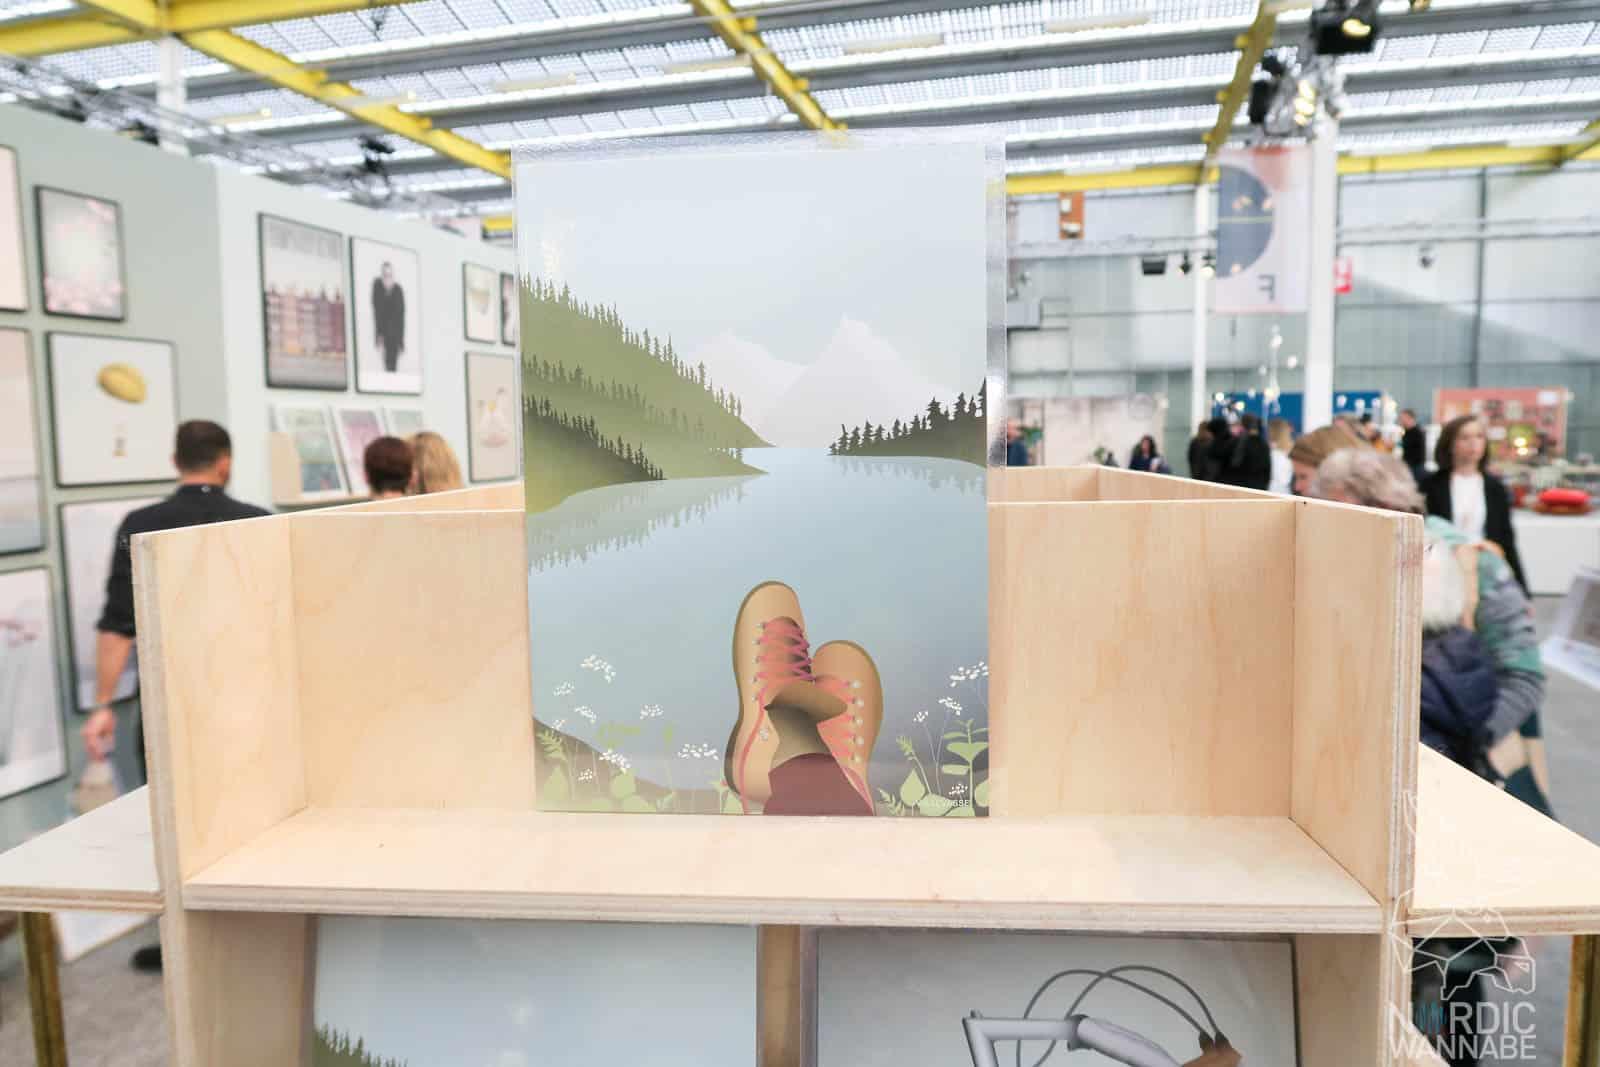 skandinavische wohntrends 2018 holland messe. Black Bedroom Furniture Sets. Home Design Ideas